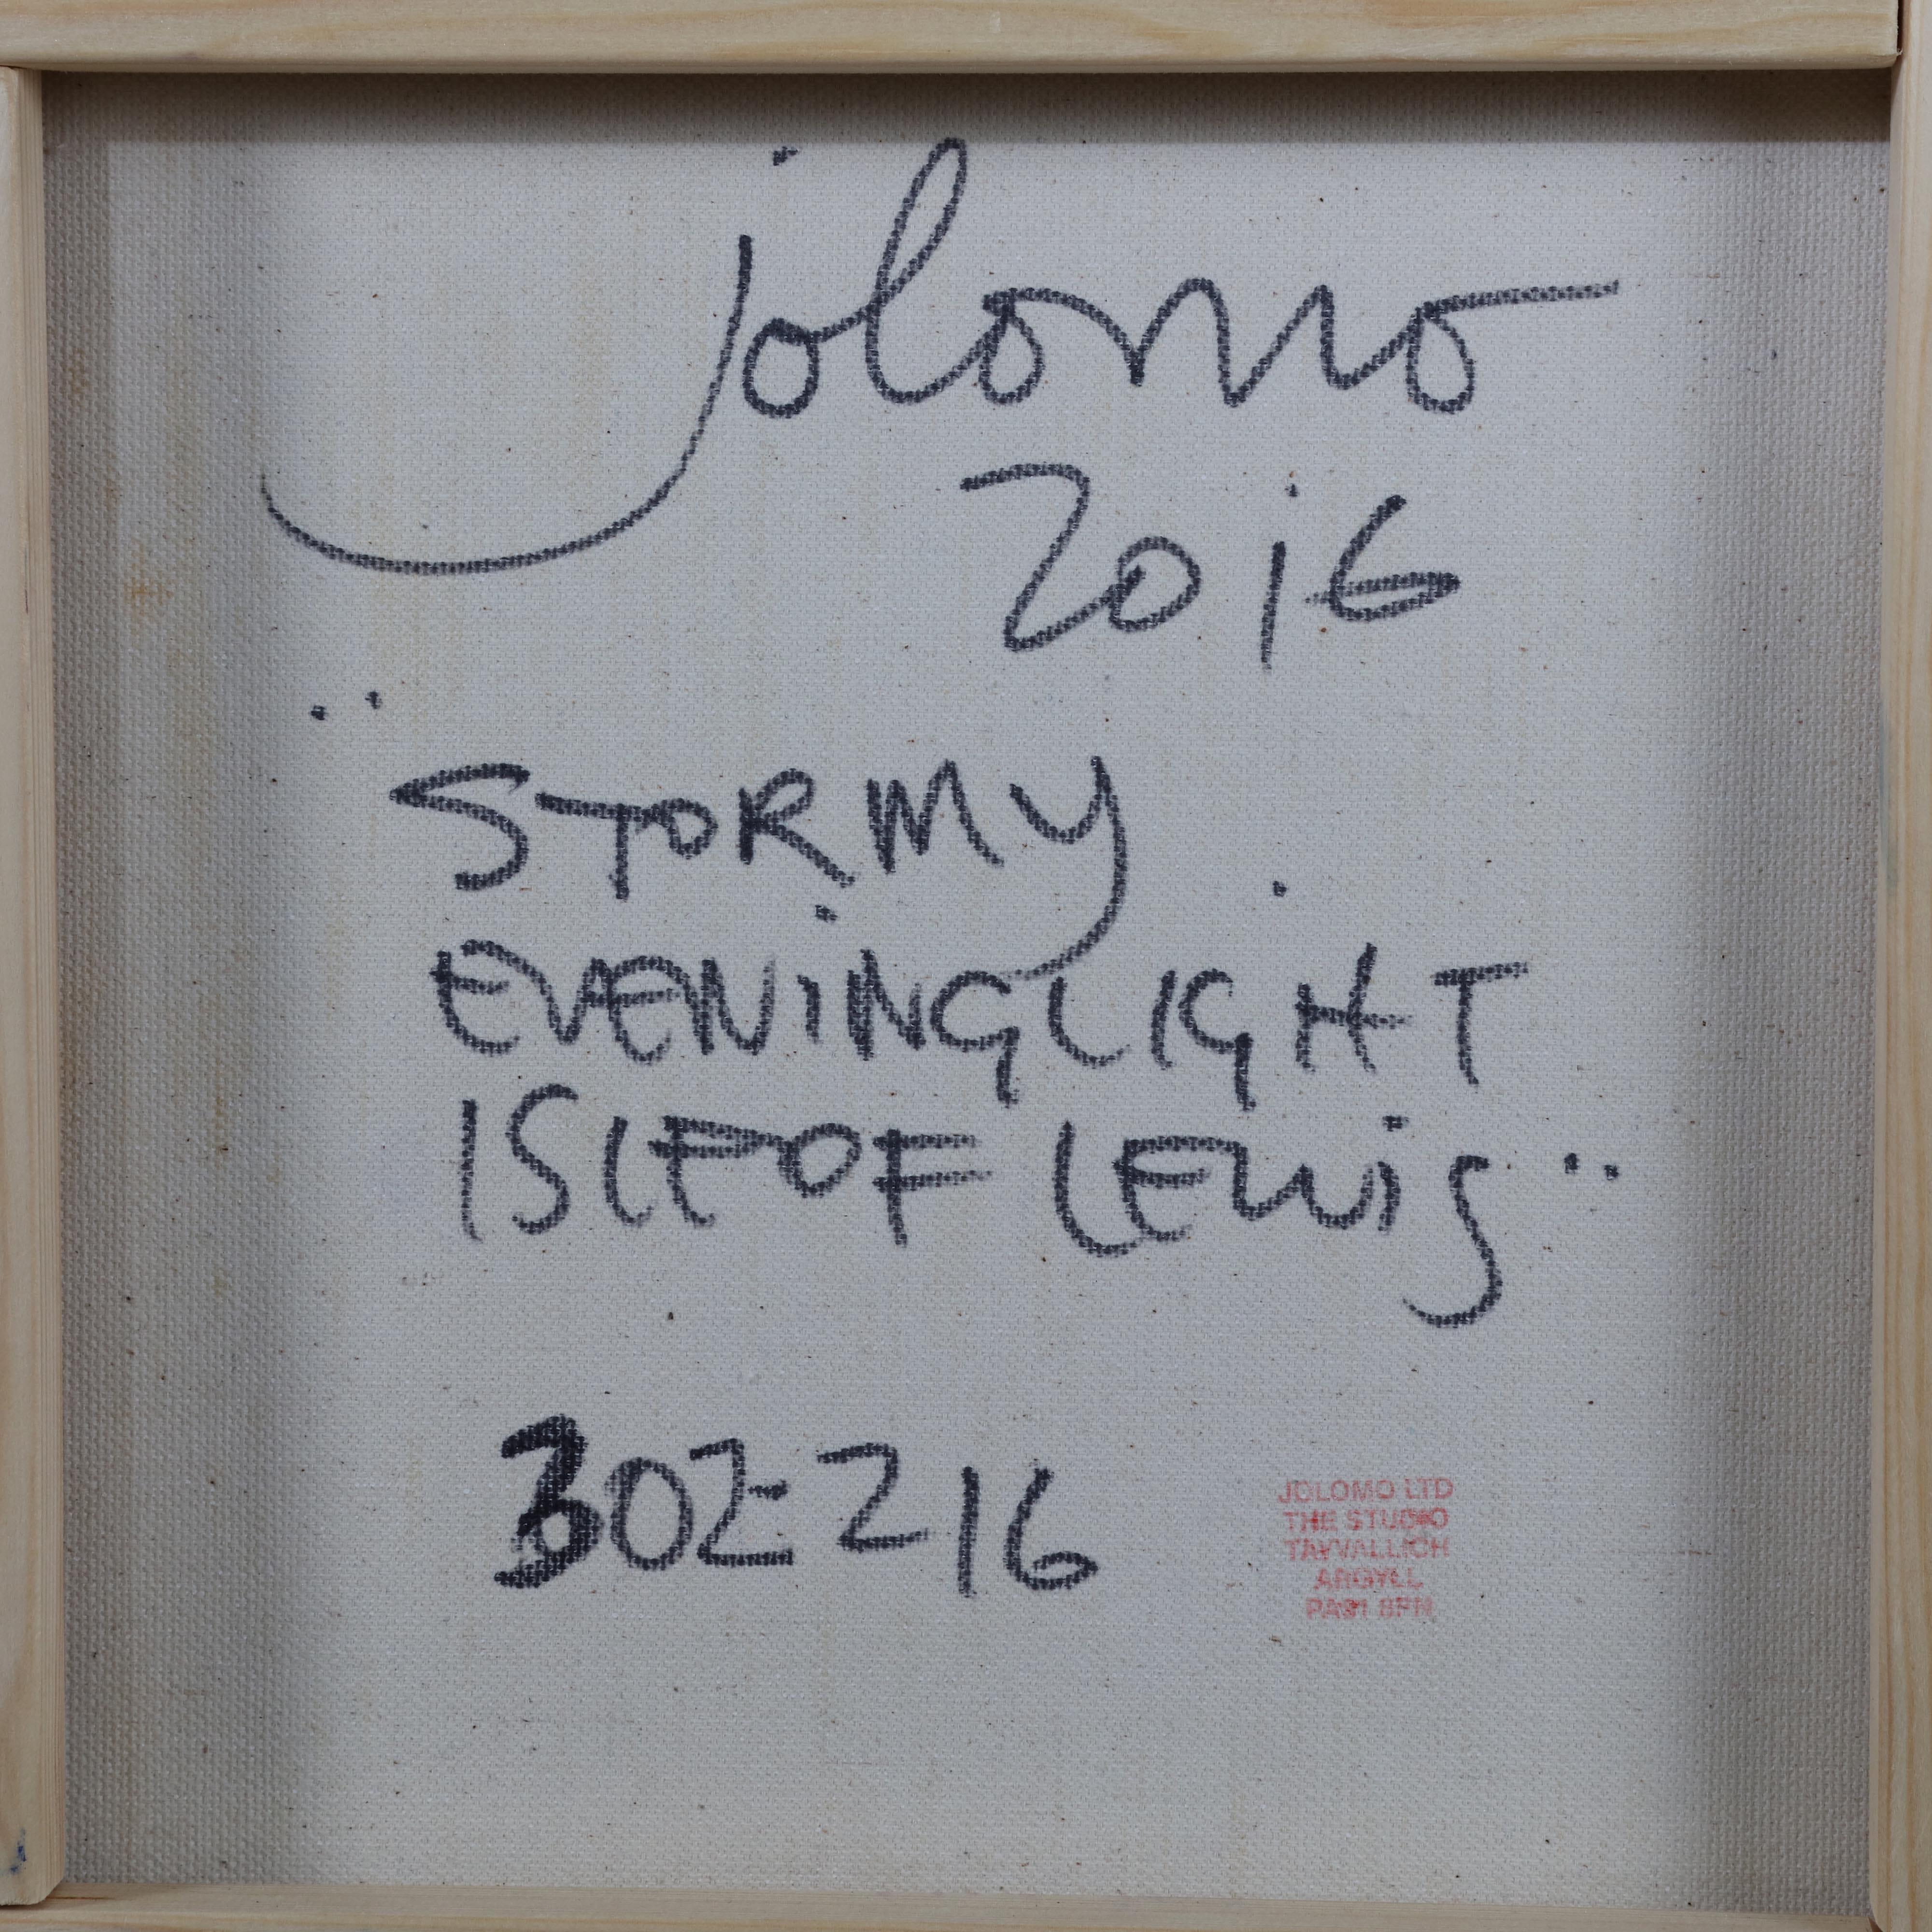 John Lowrie Morrison Stormy Evening Light Isle Of